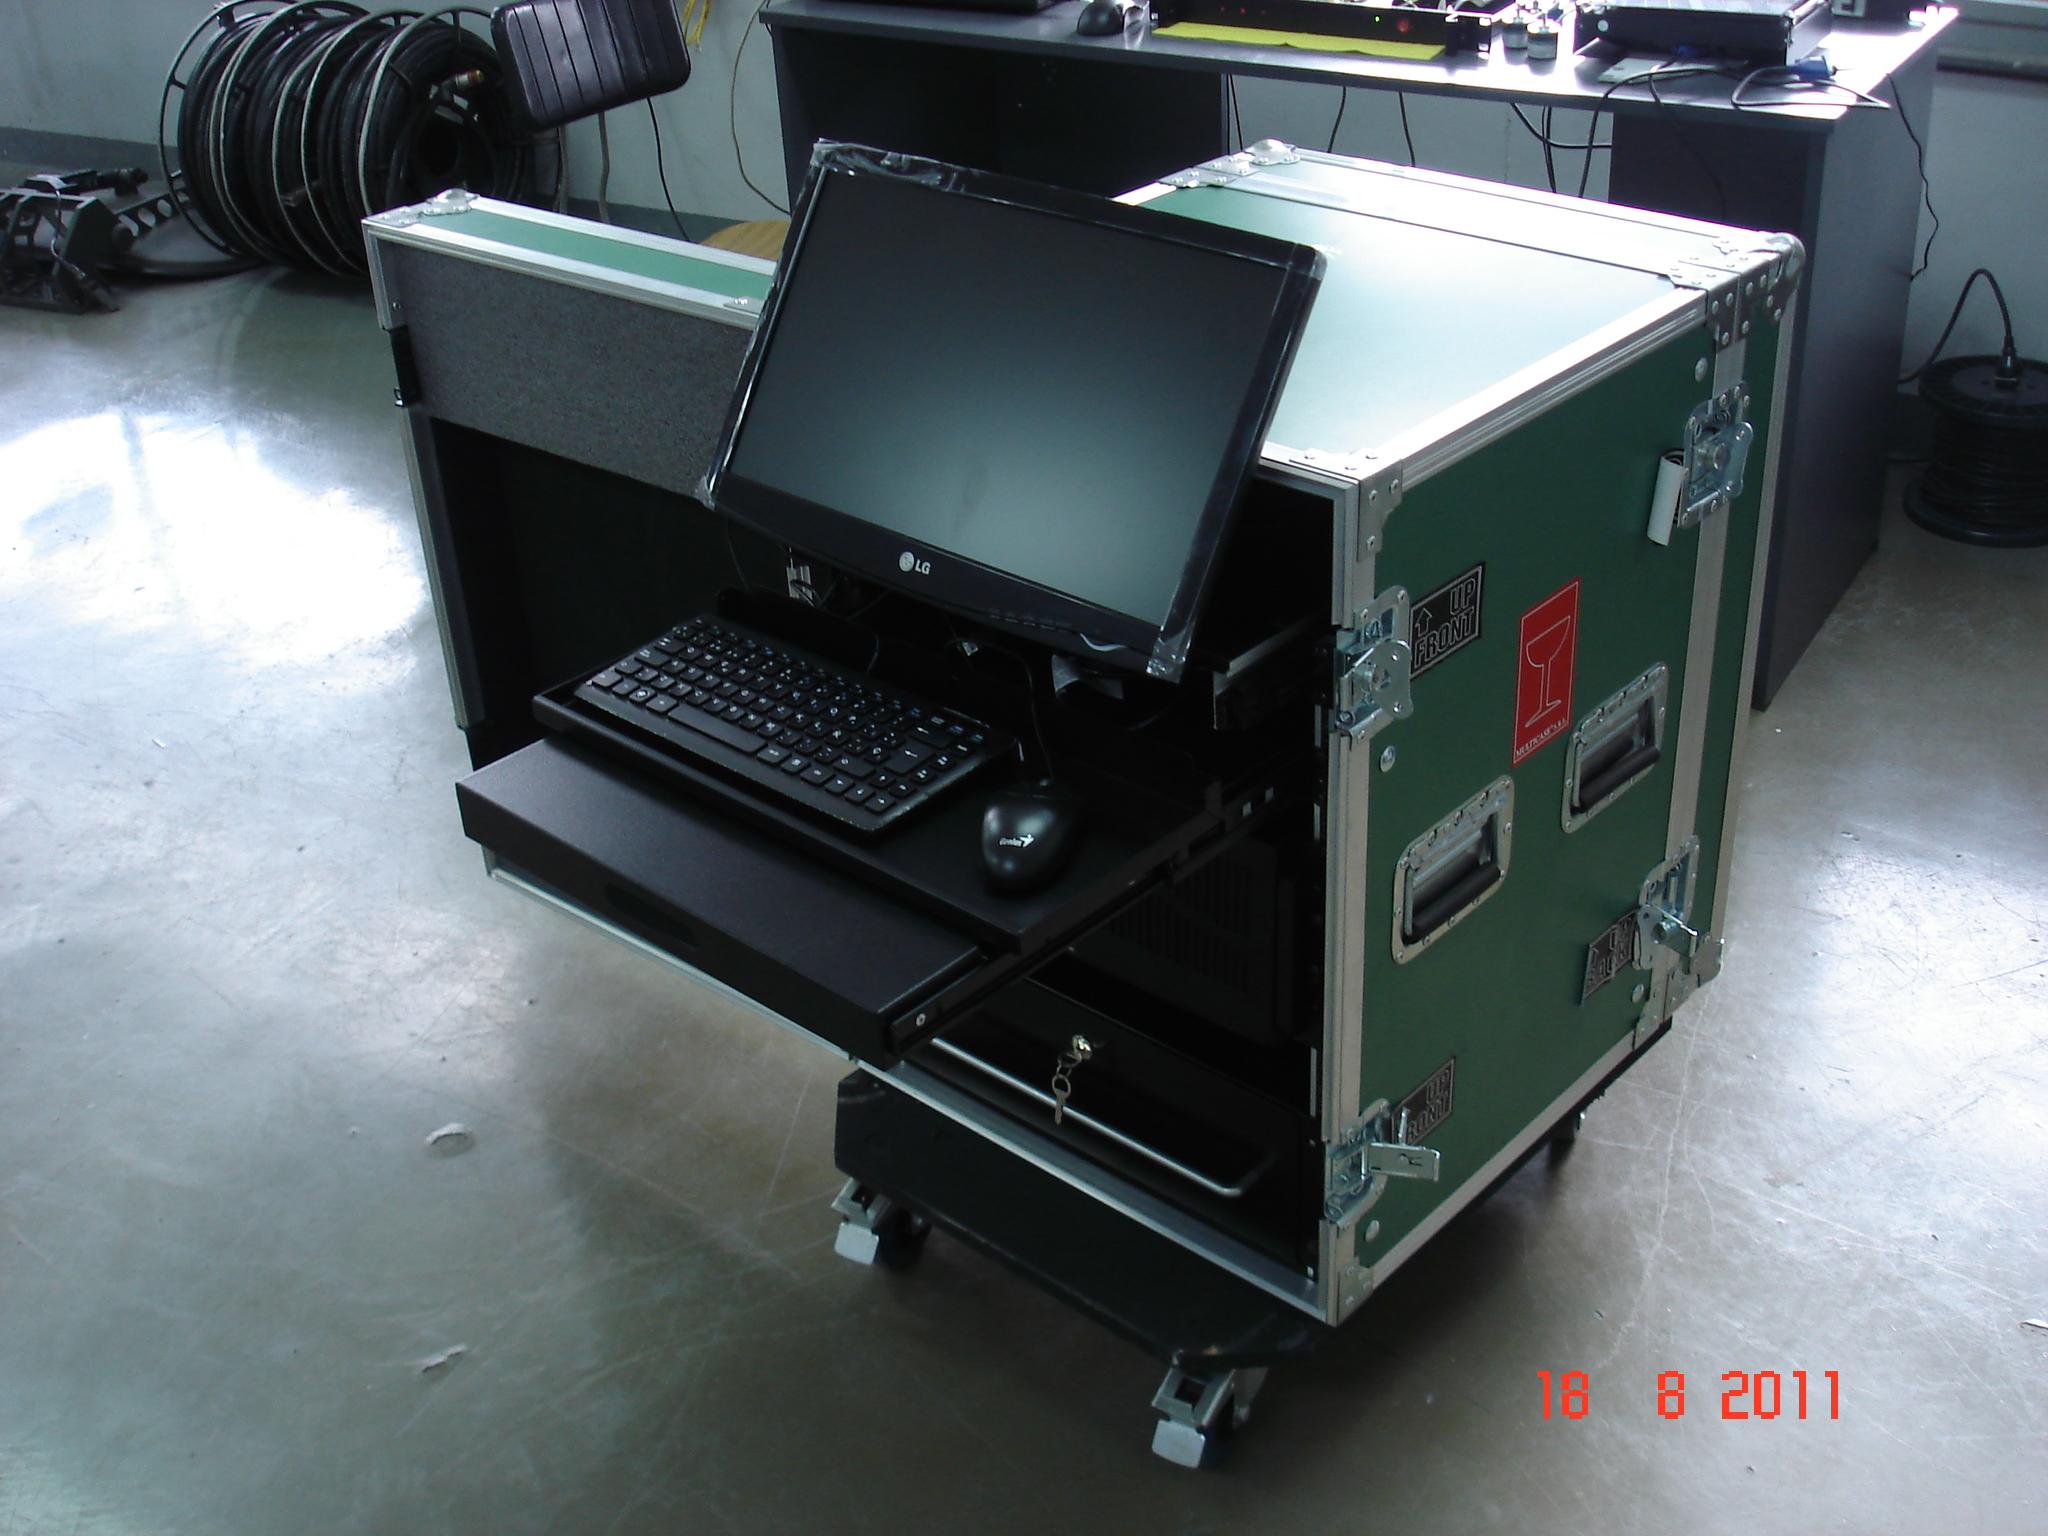 DSC09344.JPG